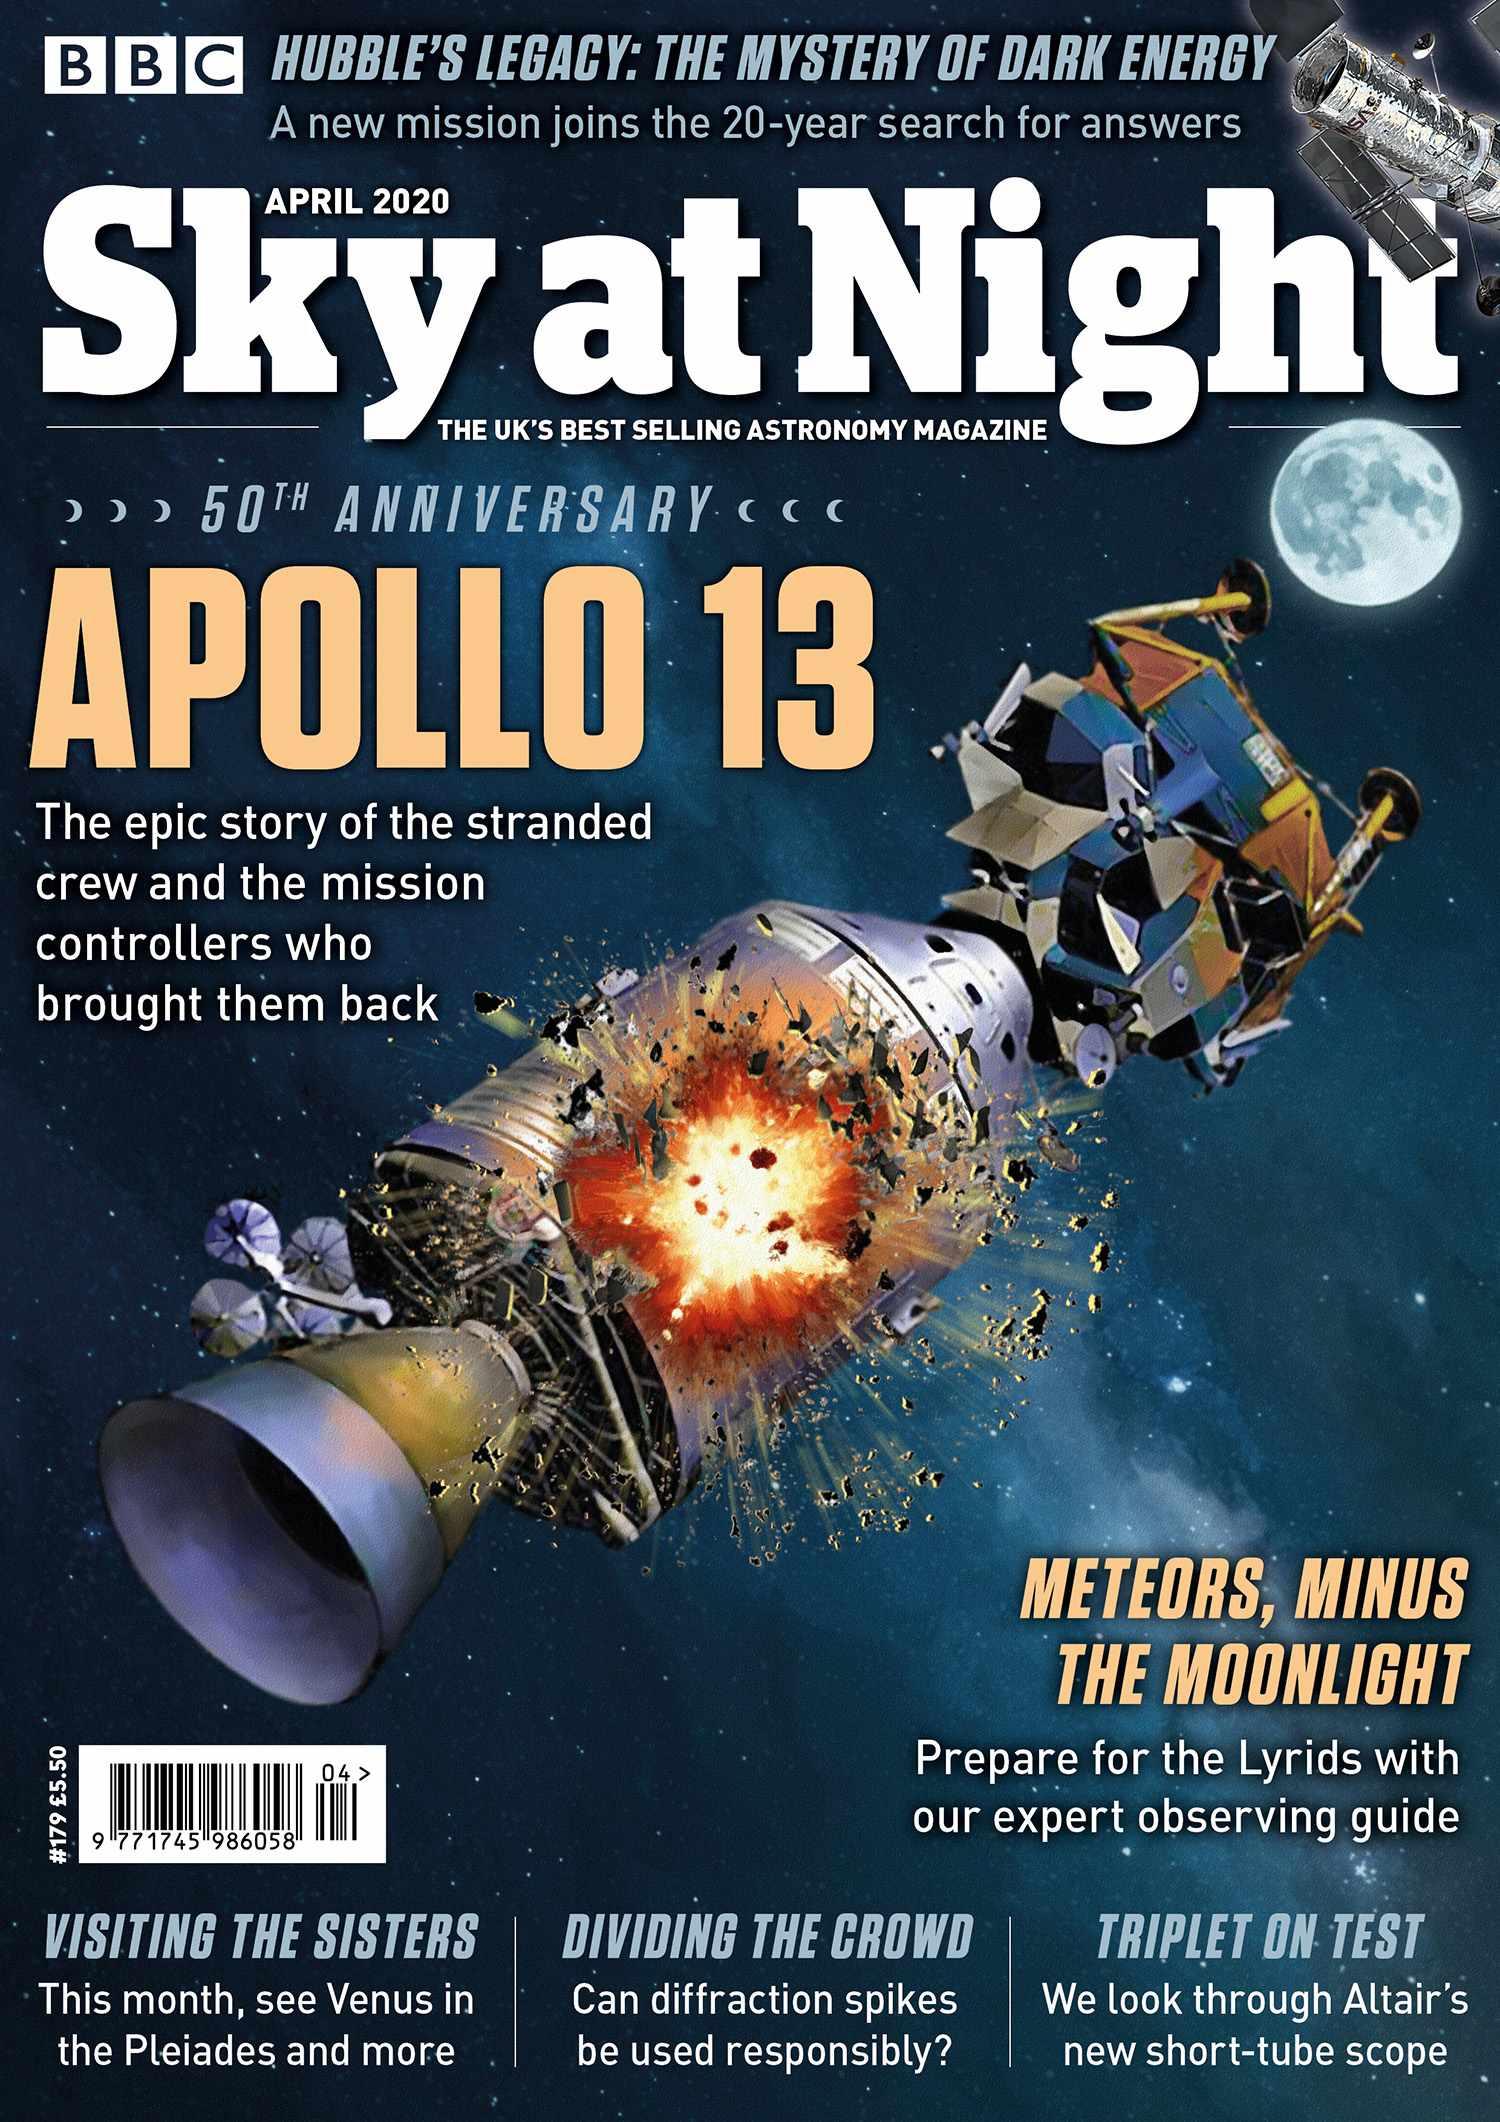 BBC Sky at Night Magazine April 2020 issue